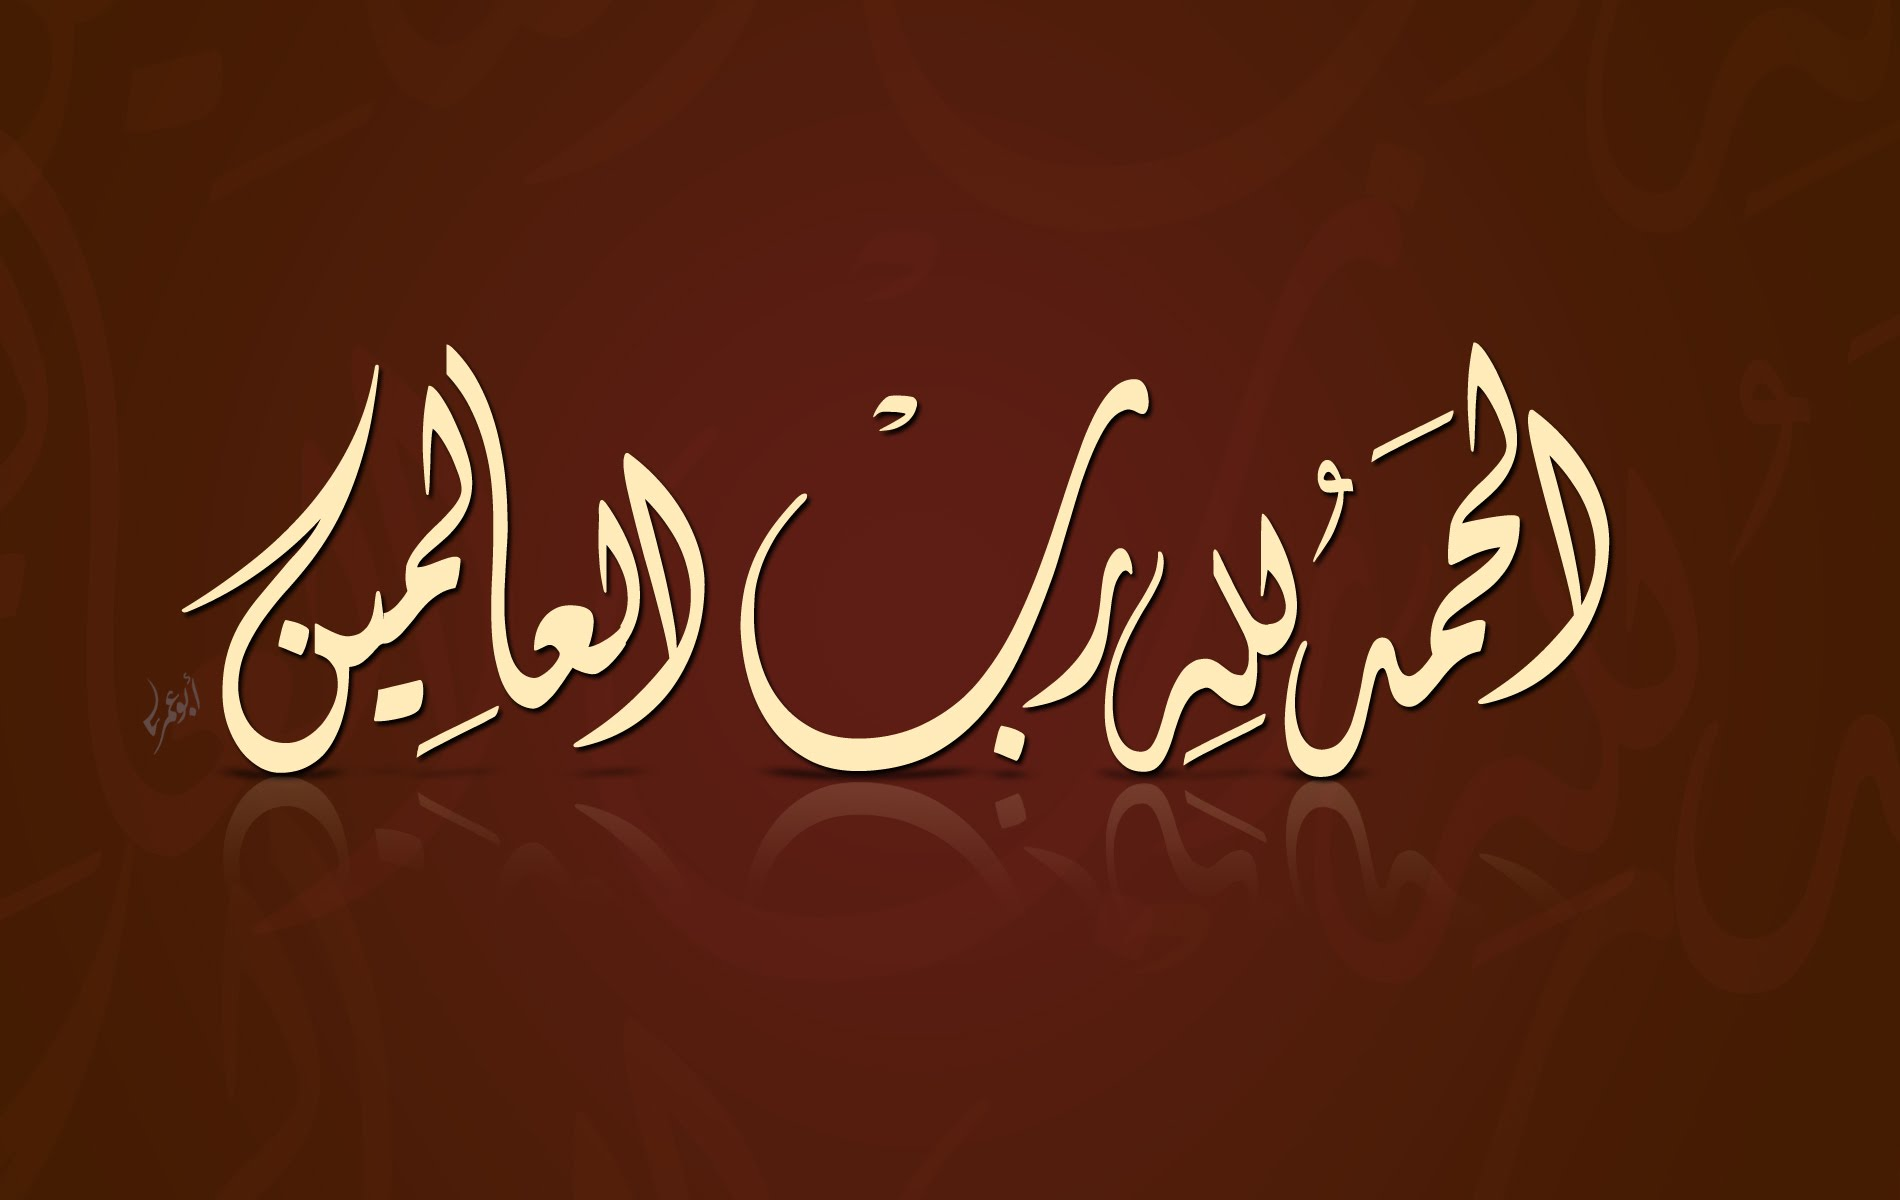 بالصور صور خلفيات اسلامية , صور اسلاميه جميله 3892 1